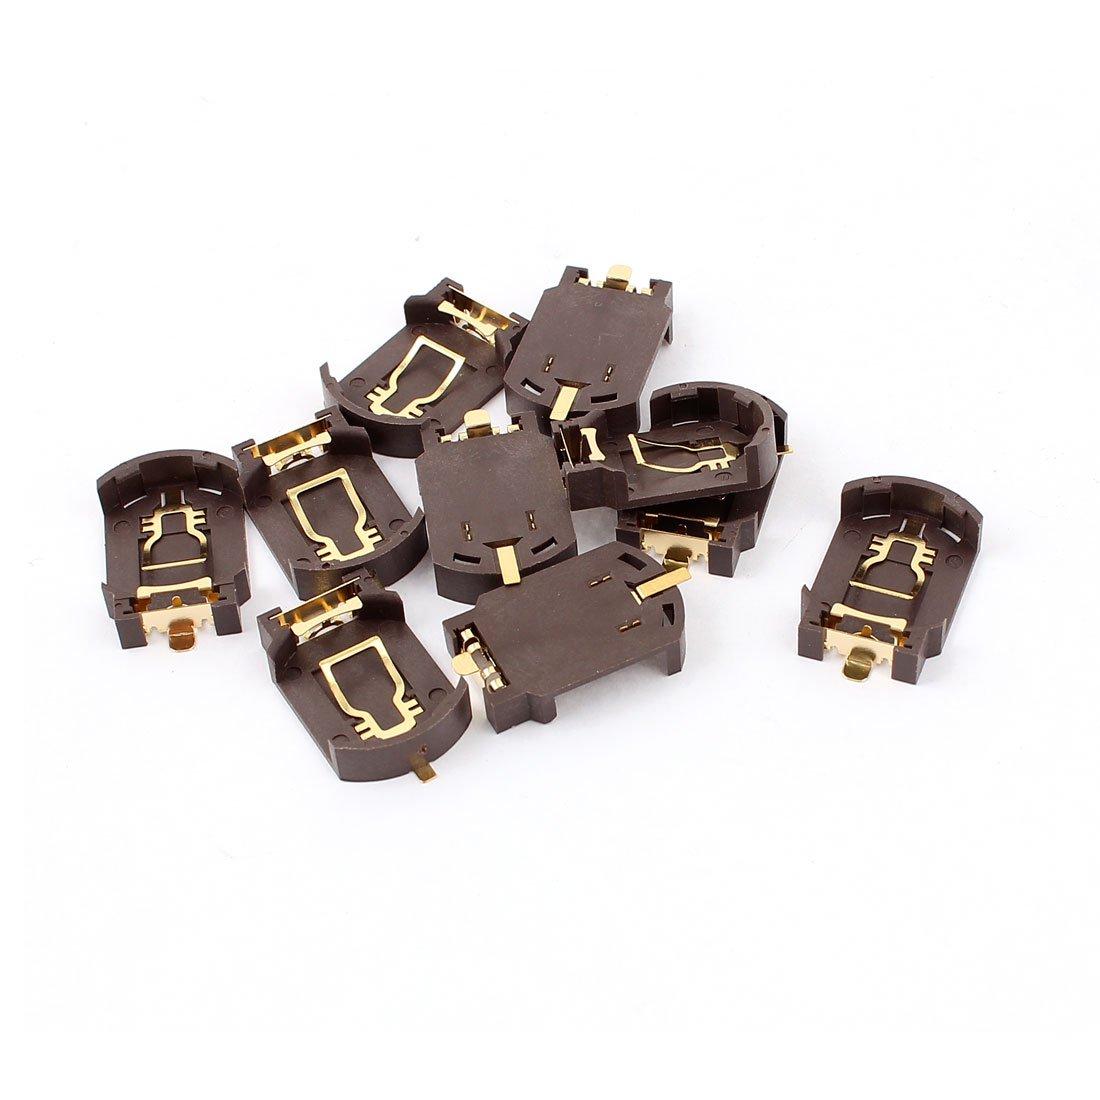 10Pcs Plastic Button Cell Battery Socket Holder for CR2032 Brown